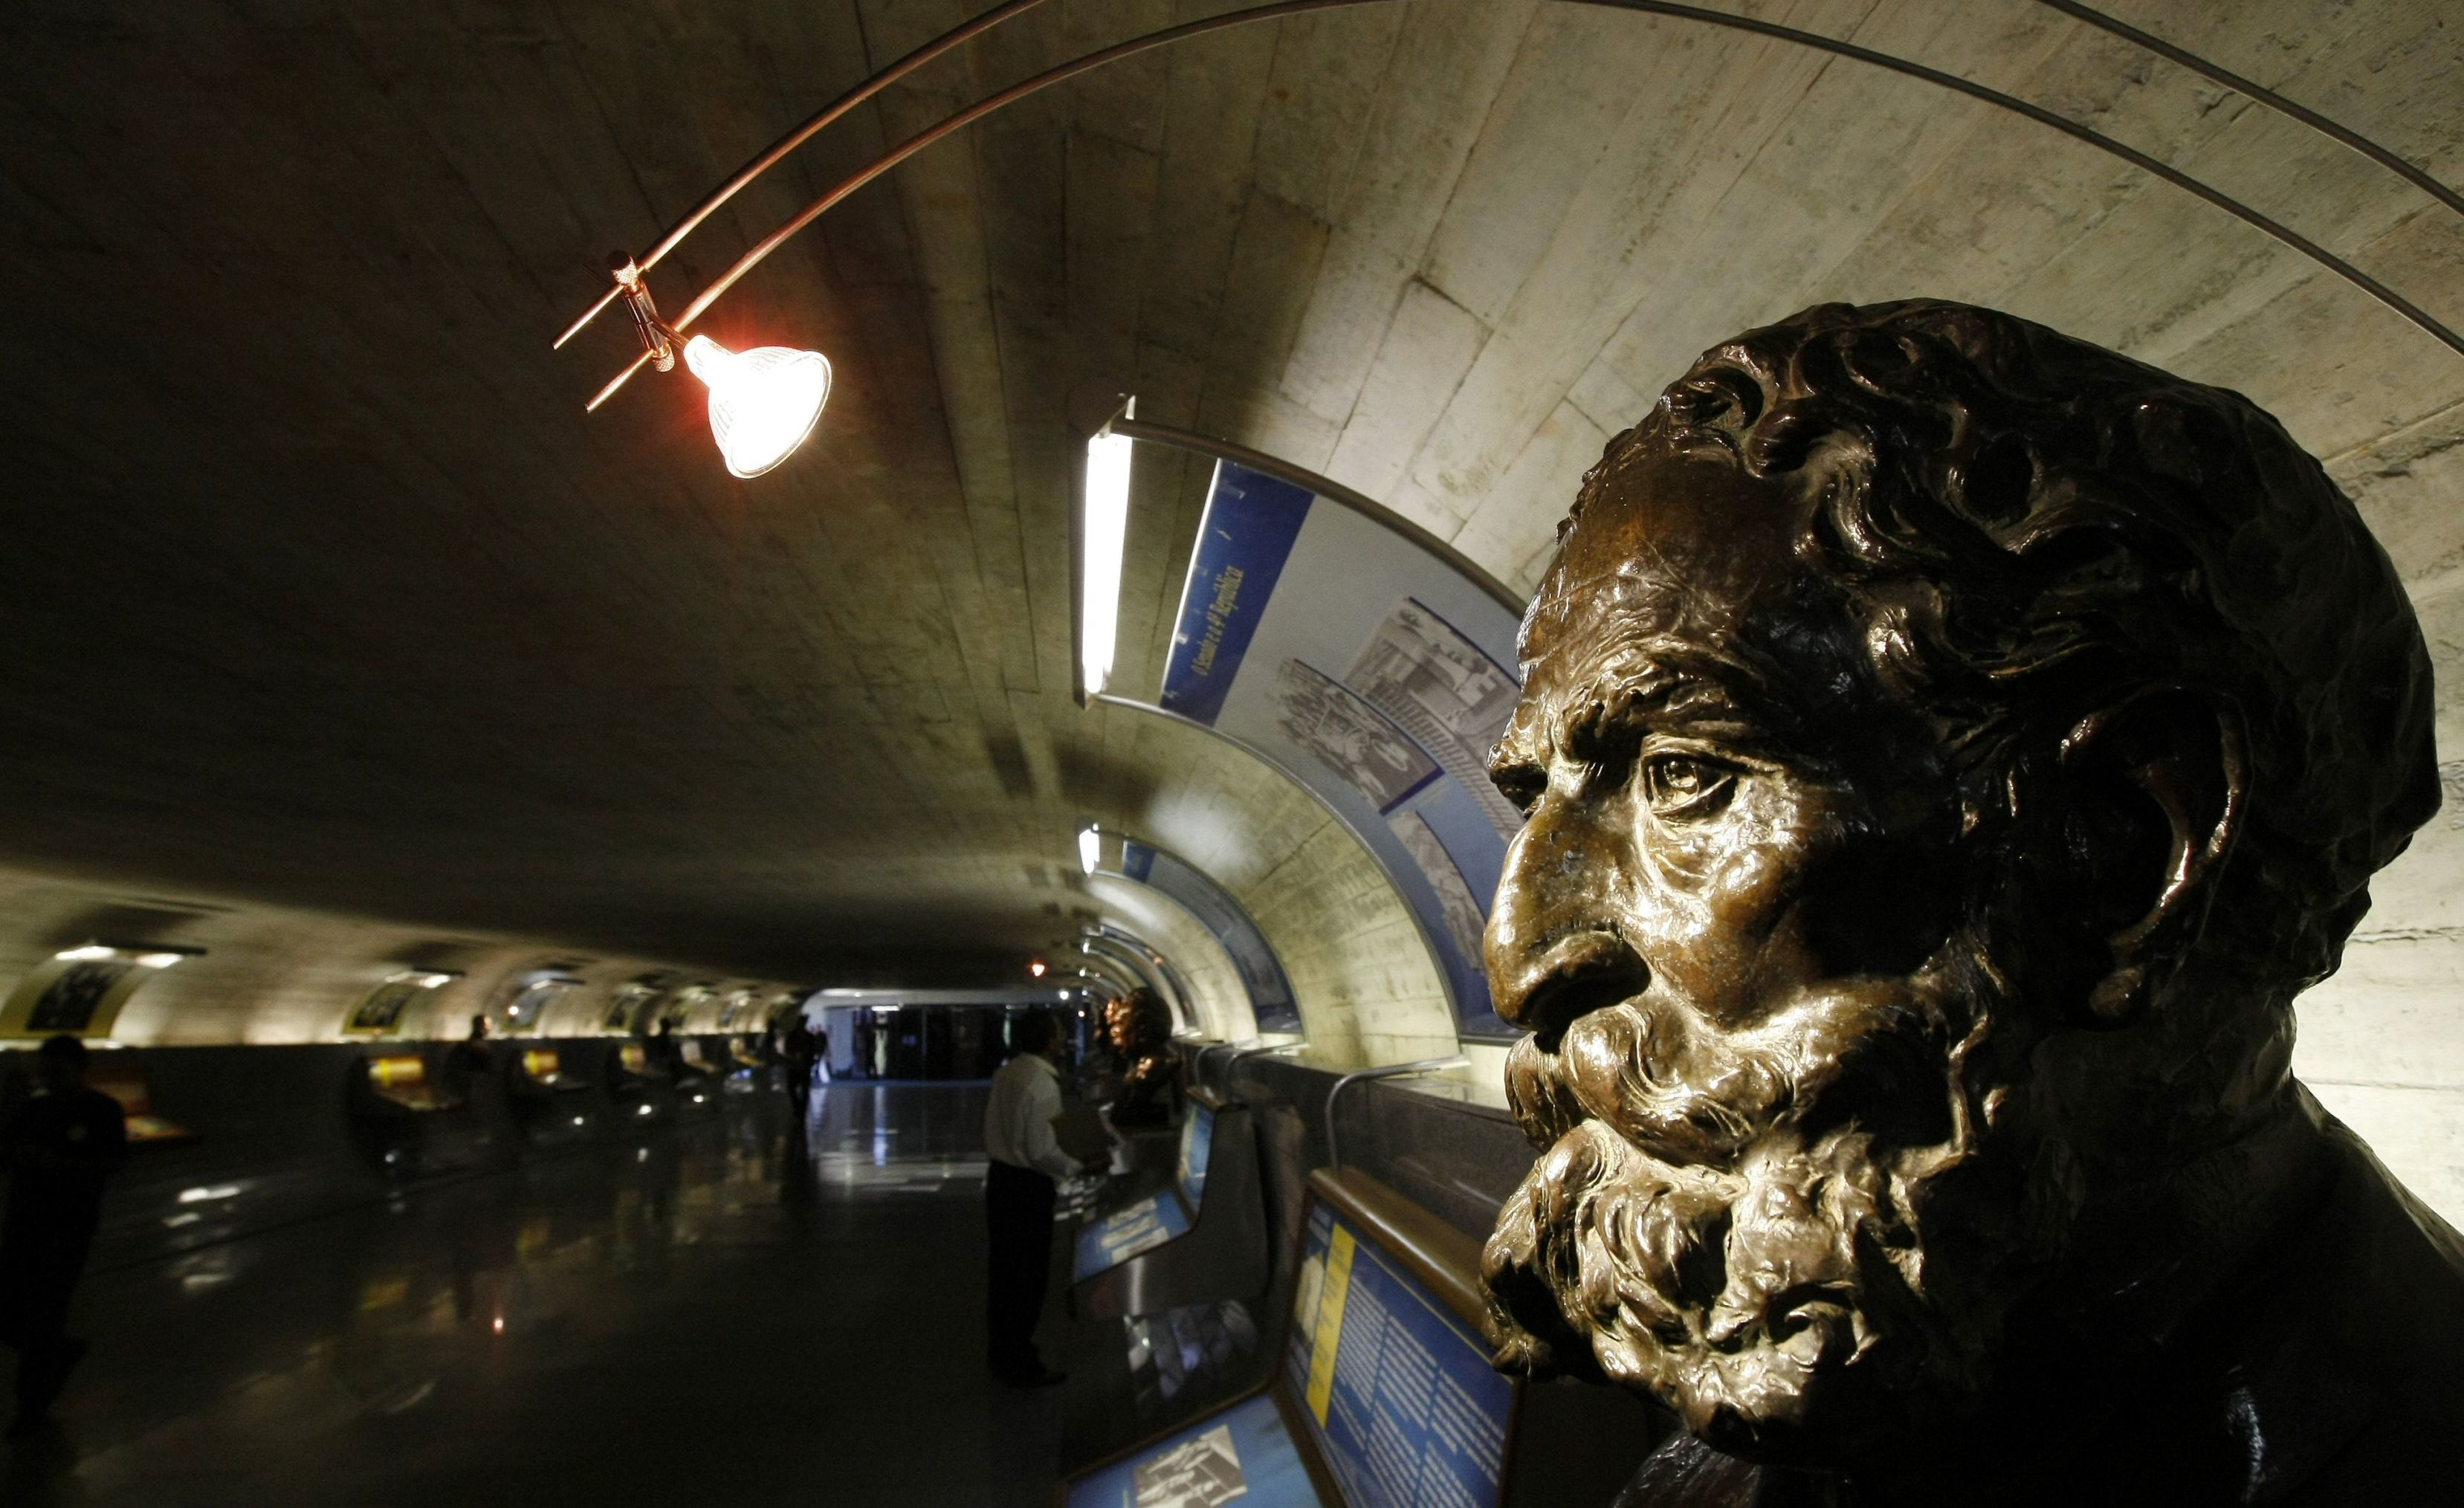 Busto do Marechal Deodoro da Fonseca, proclamador da República e primeiro presidente, no Túnel do Tempo do Senado Federal